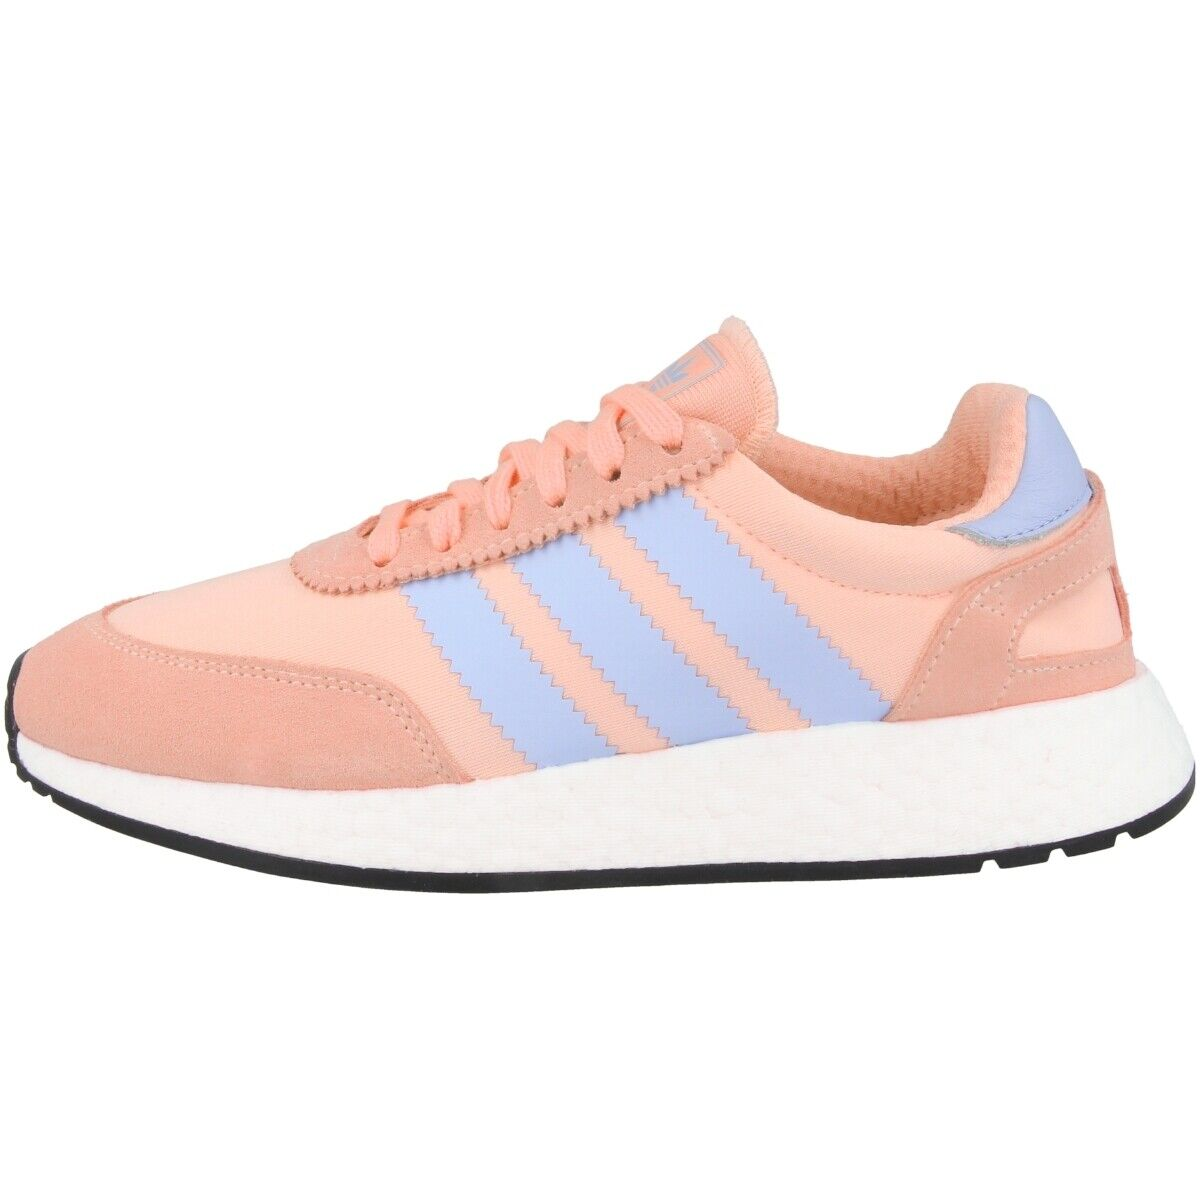 Adidas I-5923 damen Schuhe Damen Originals Freizeit Turnschuhe Turnschuhe CG6025